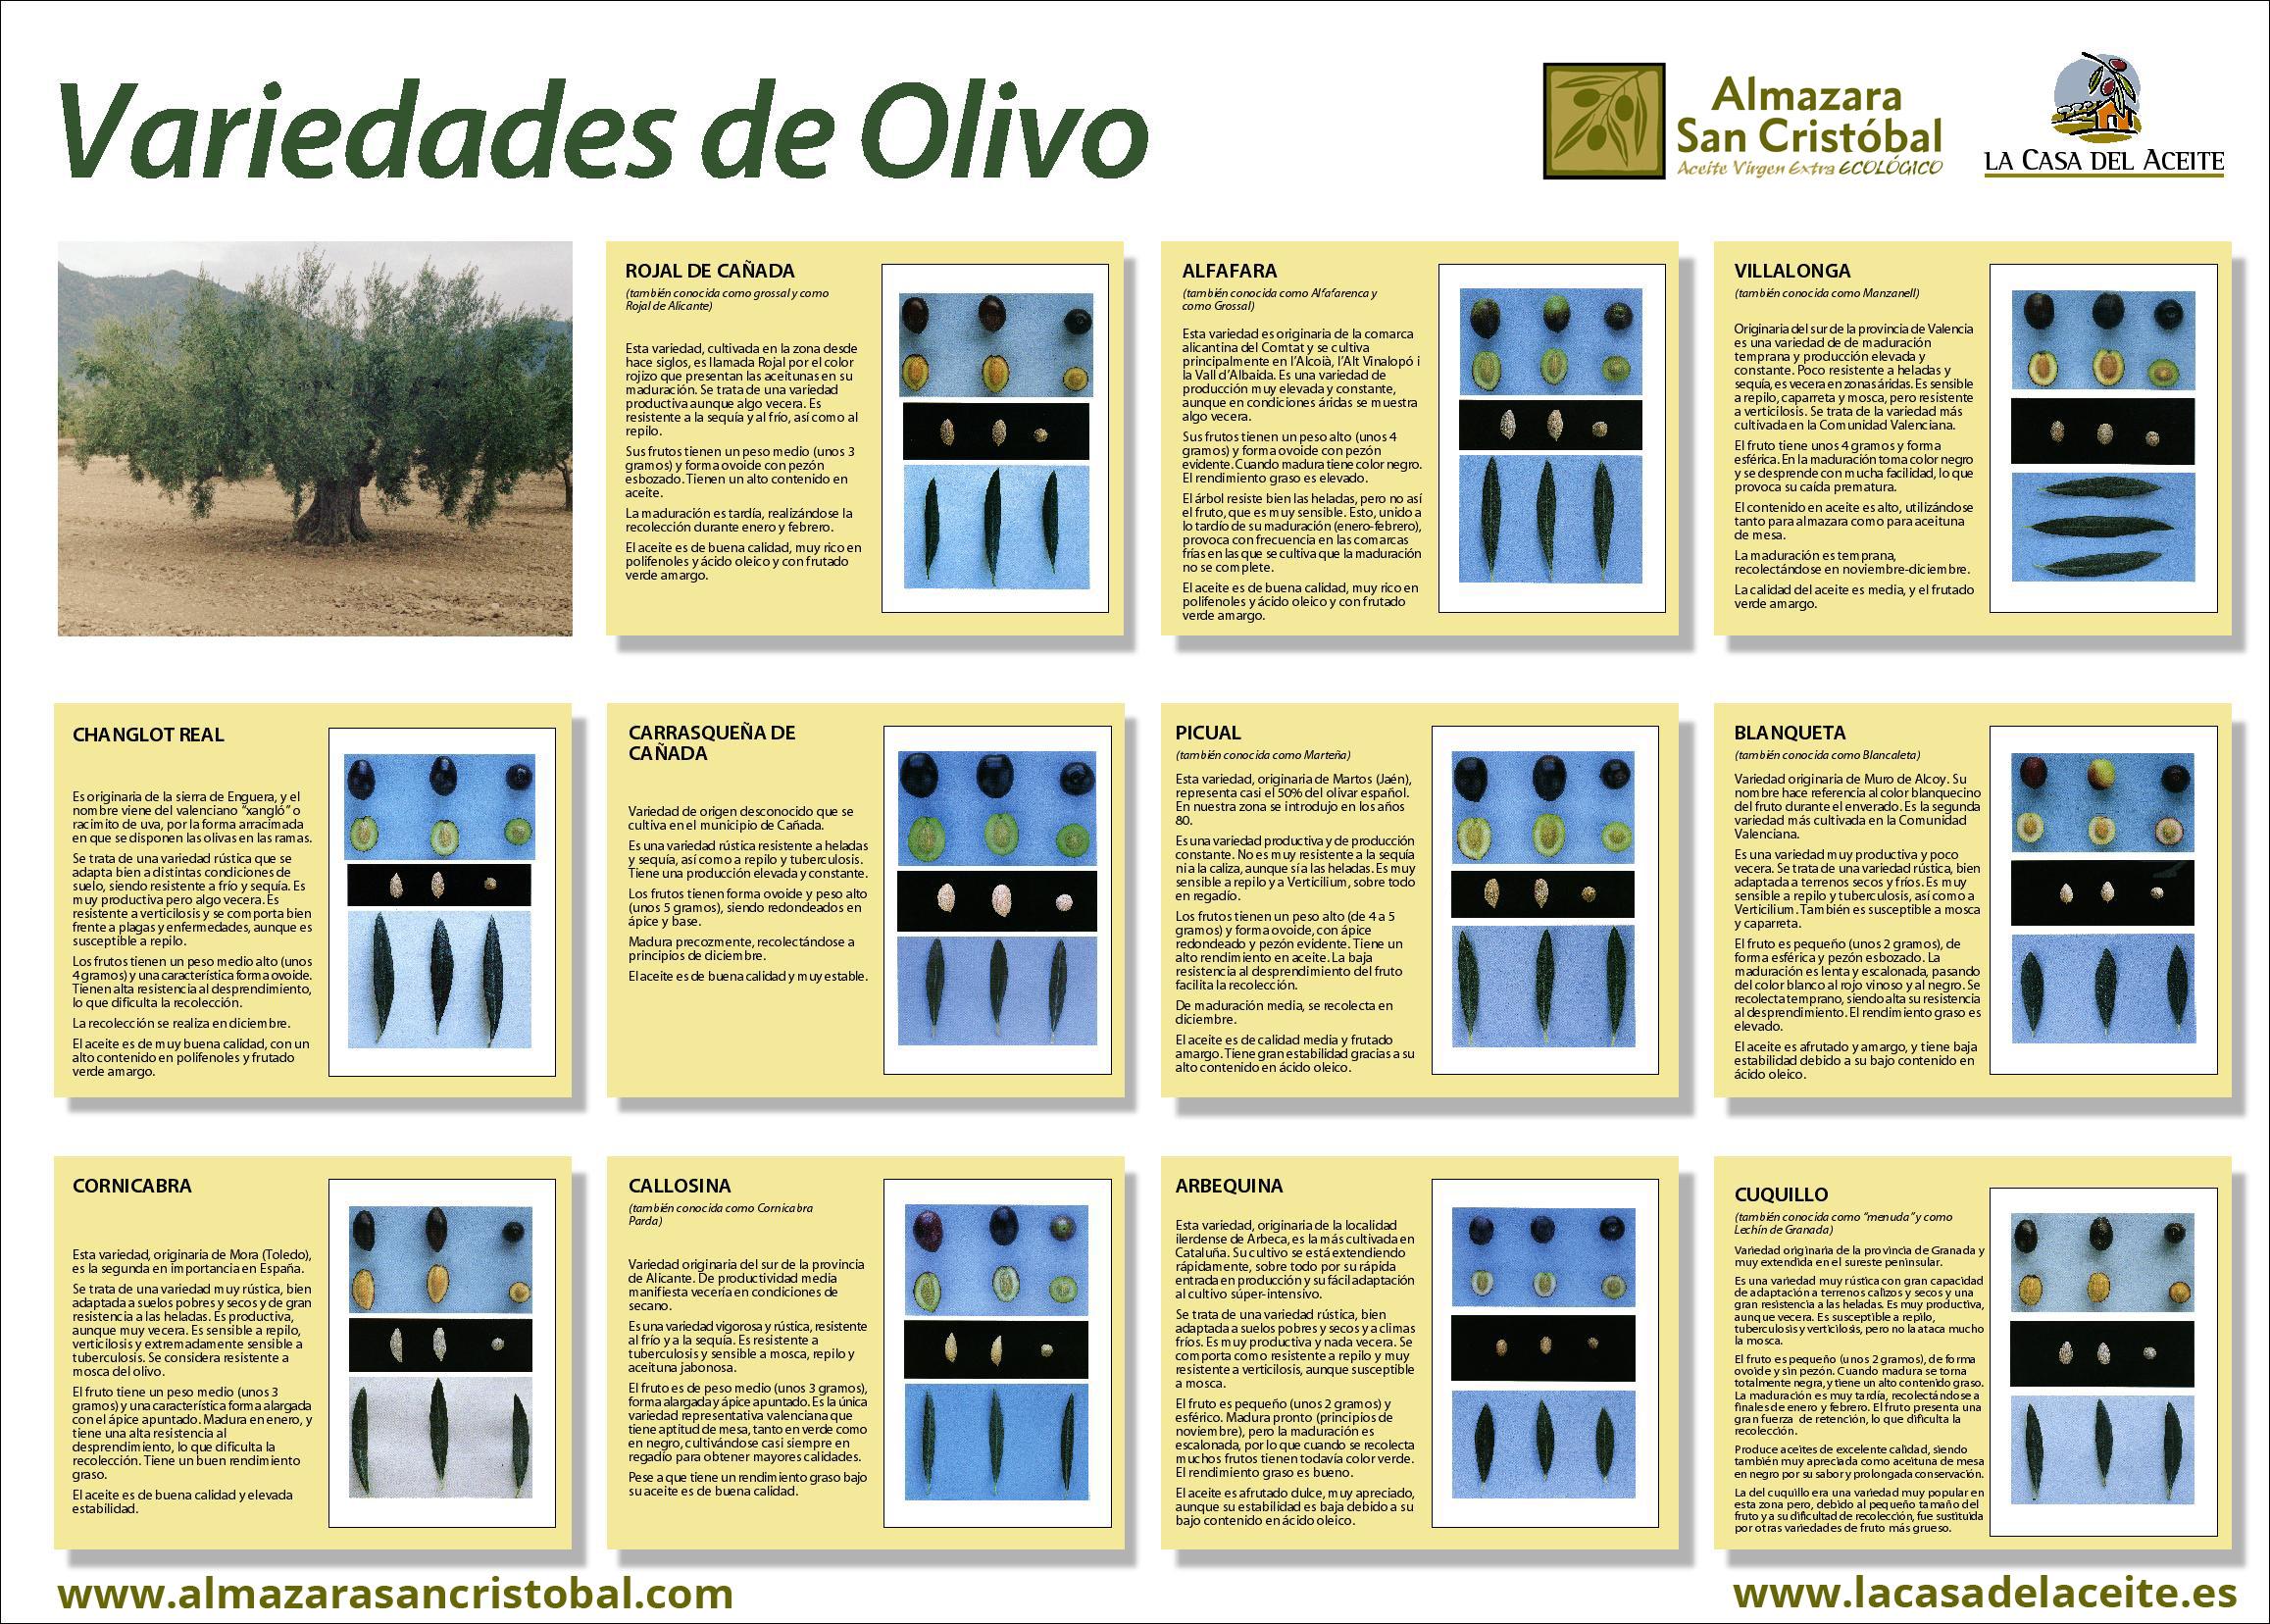 variedades-de-olivo